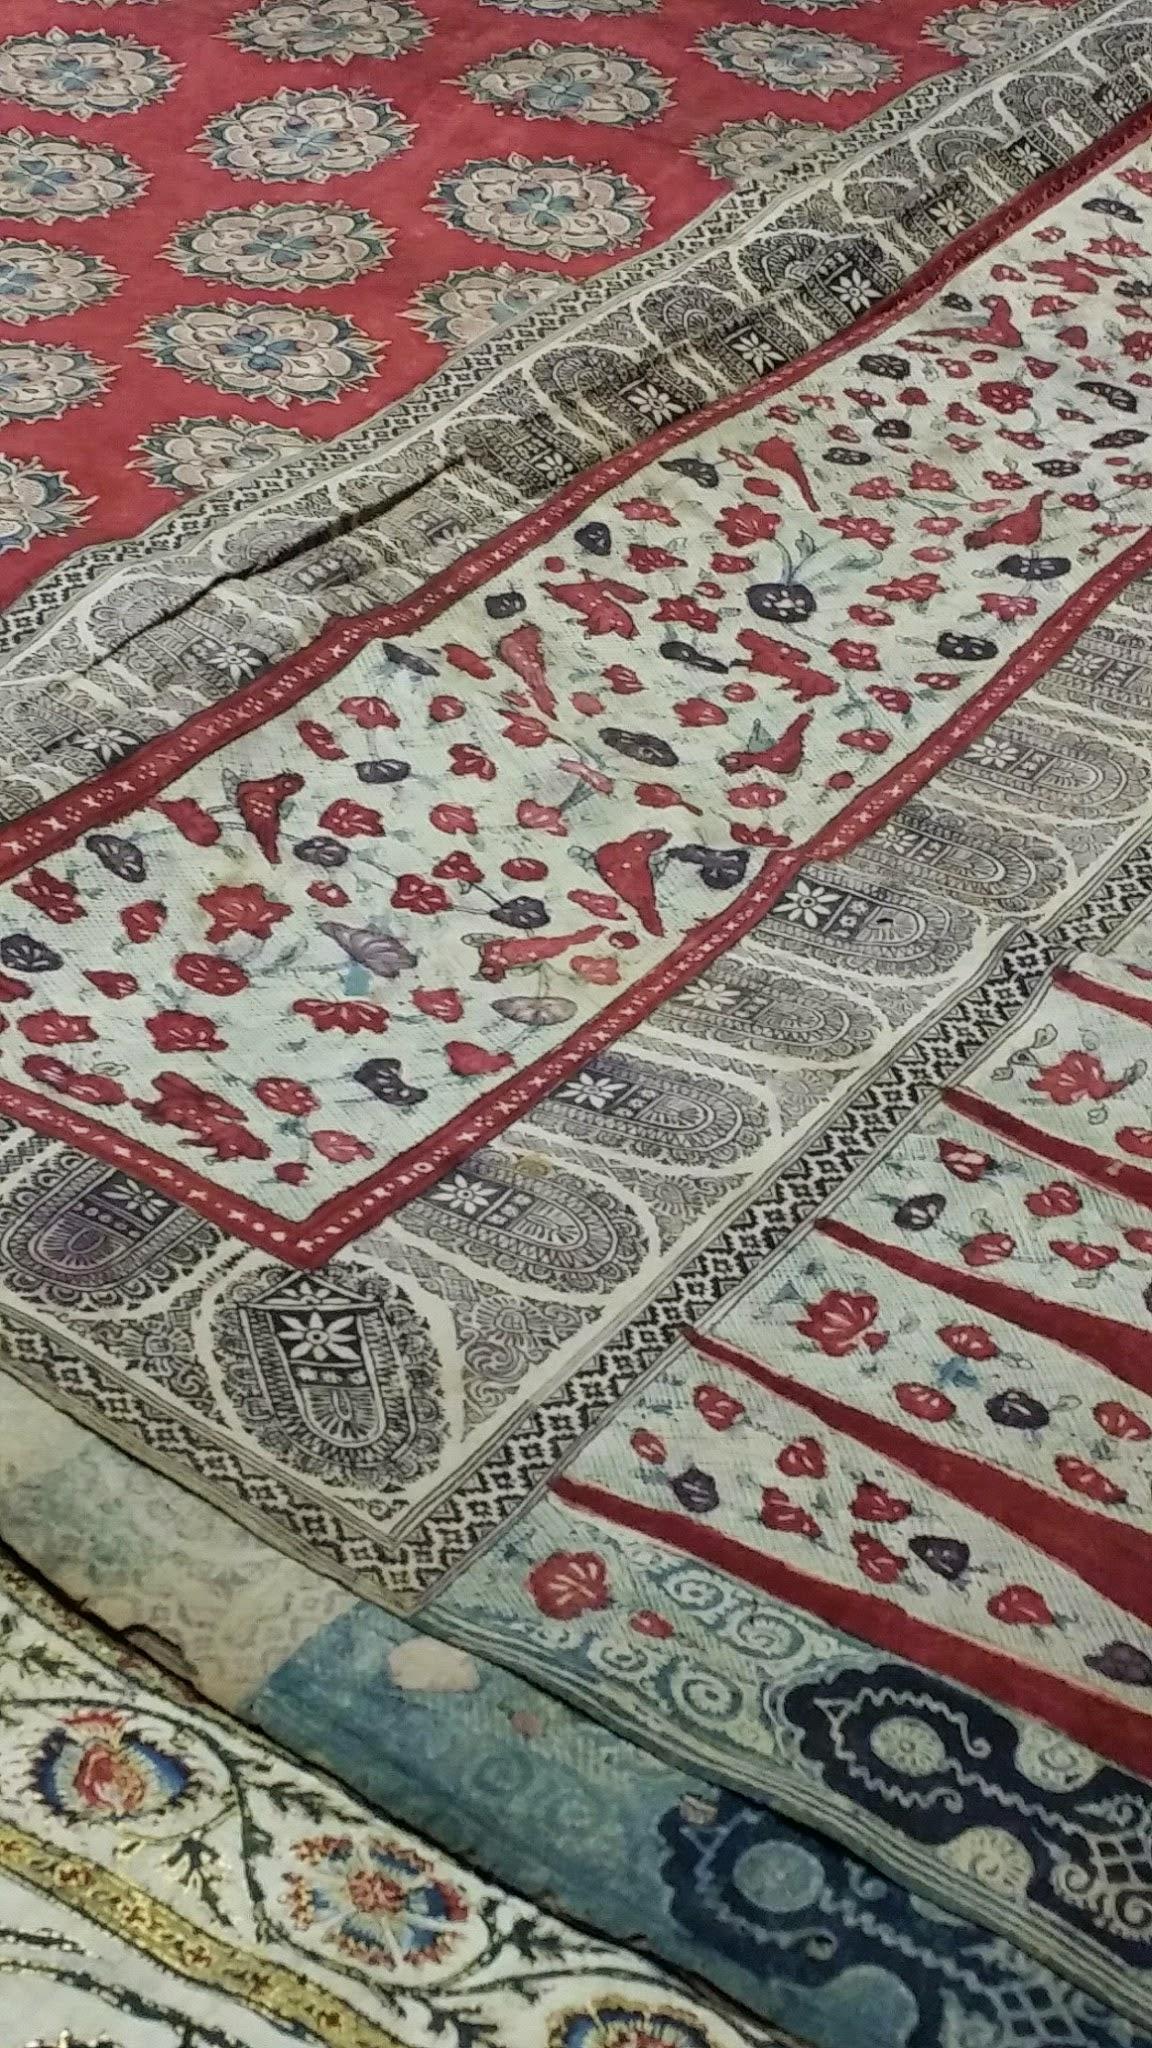 Indian Batik textiles 3.jpg